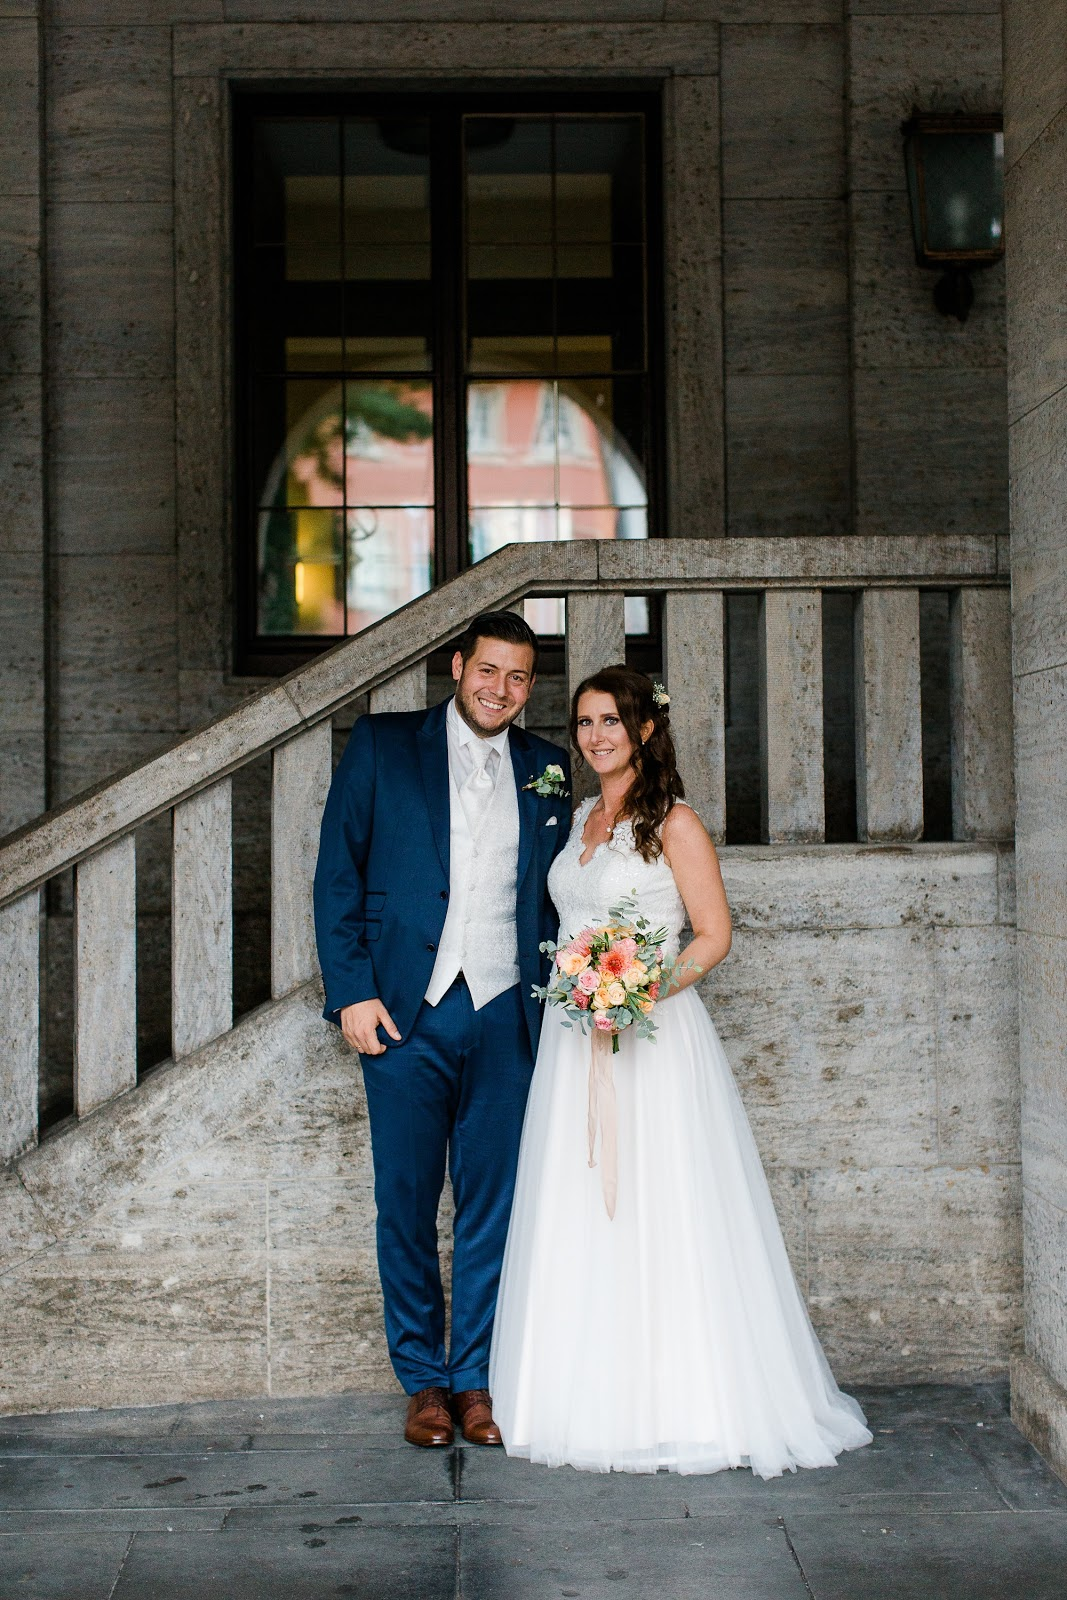 Hochzeitskleid Spitze nude